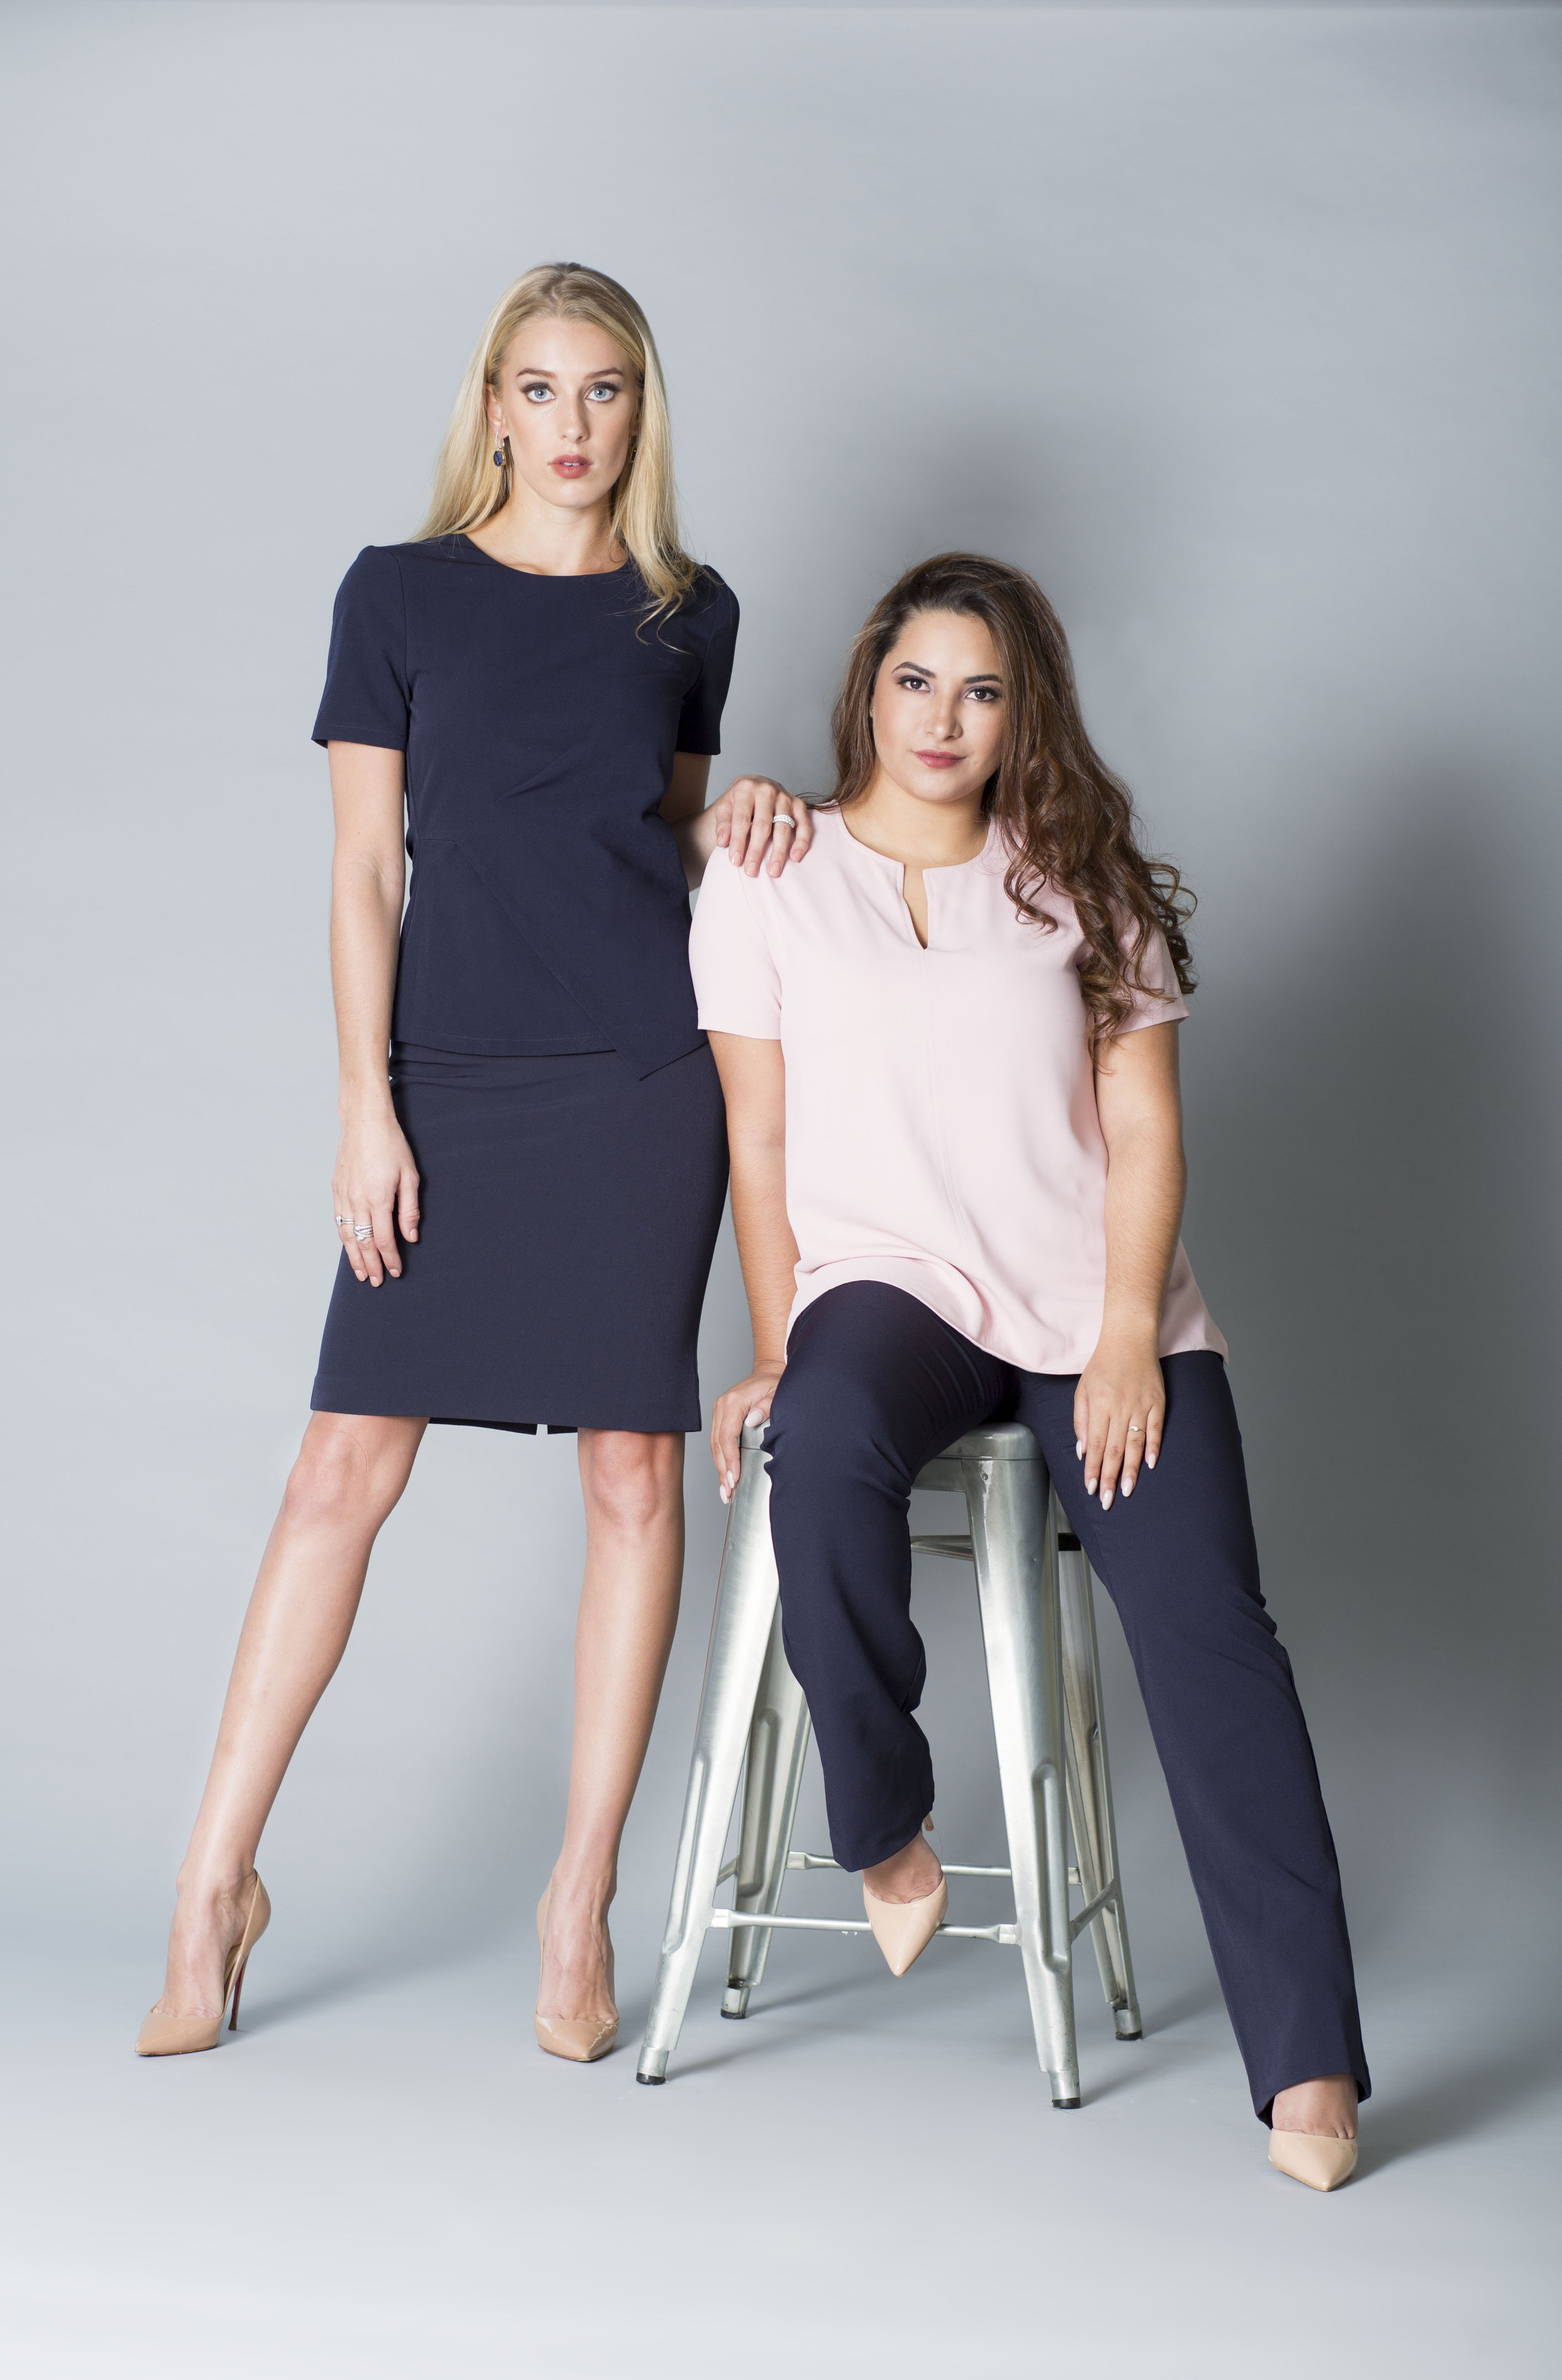 MDSN y JCLN 659 rosa -amelie pant y falda navy copy.jpg